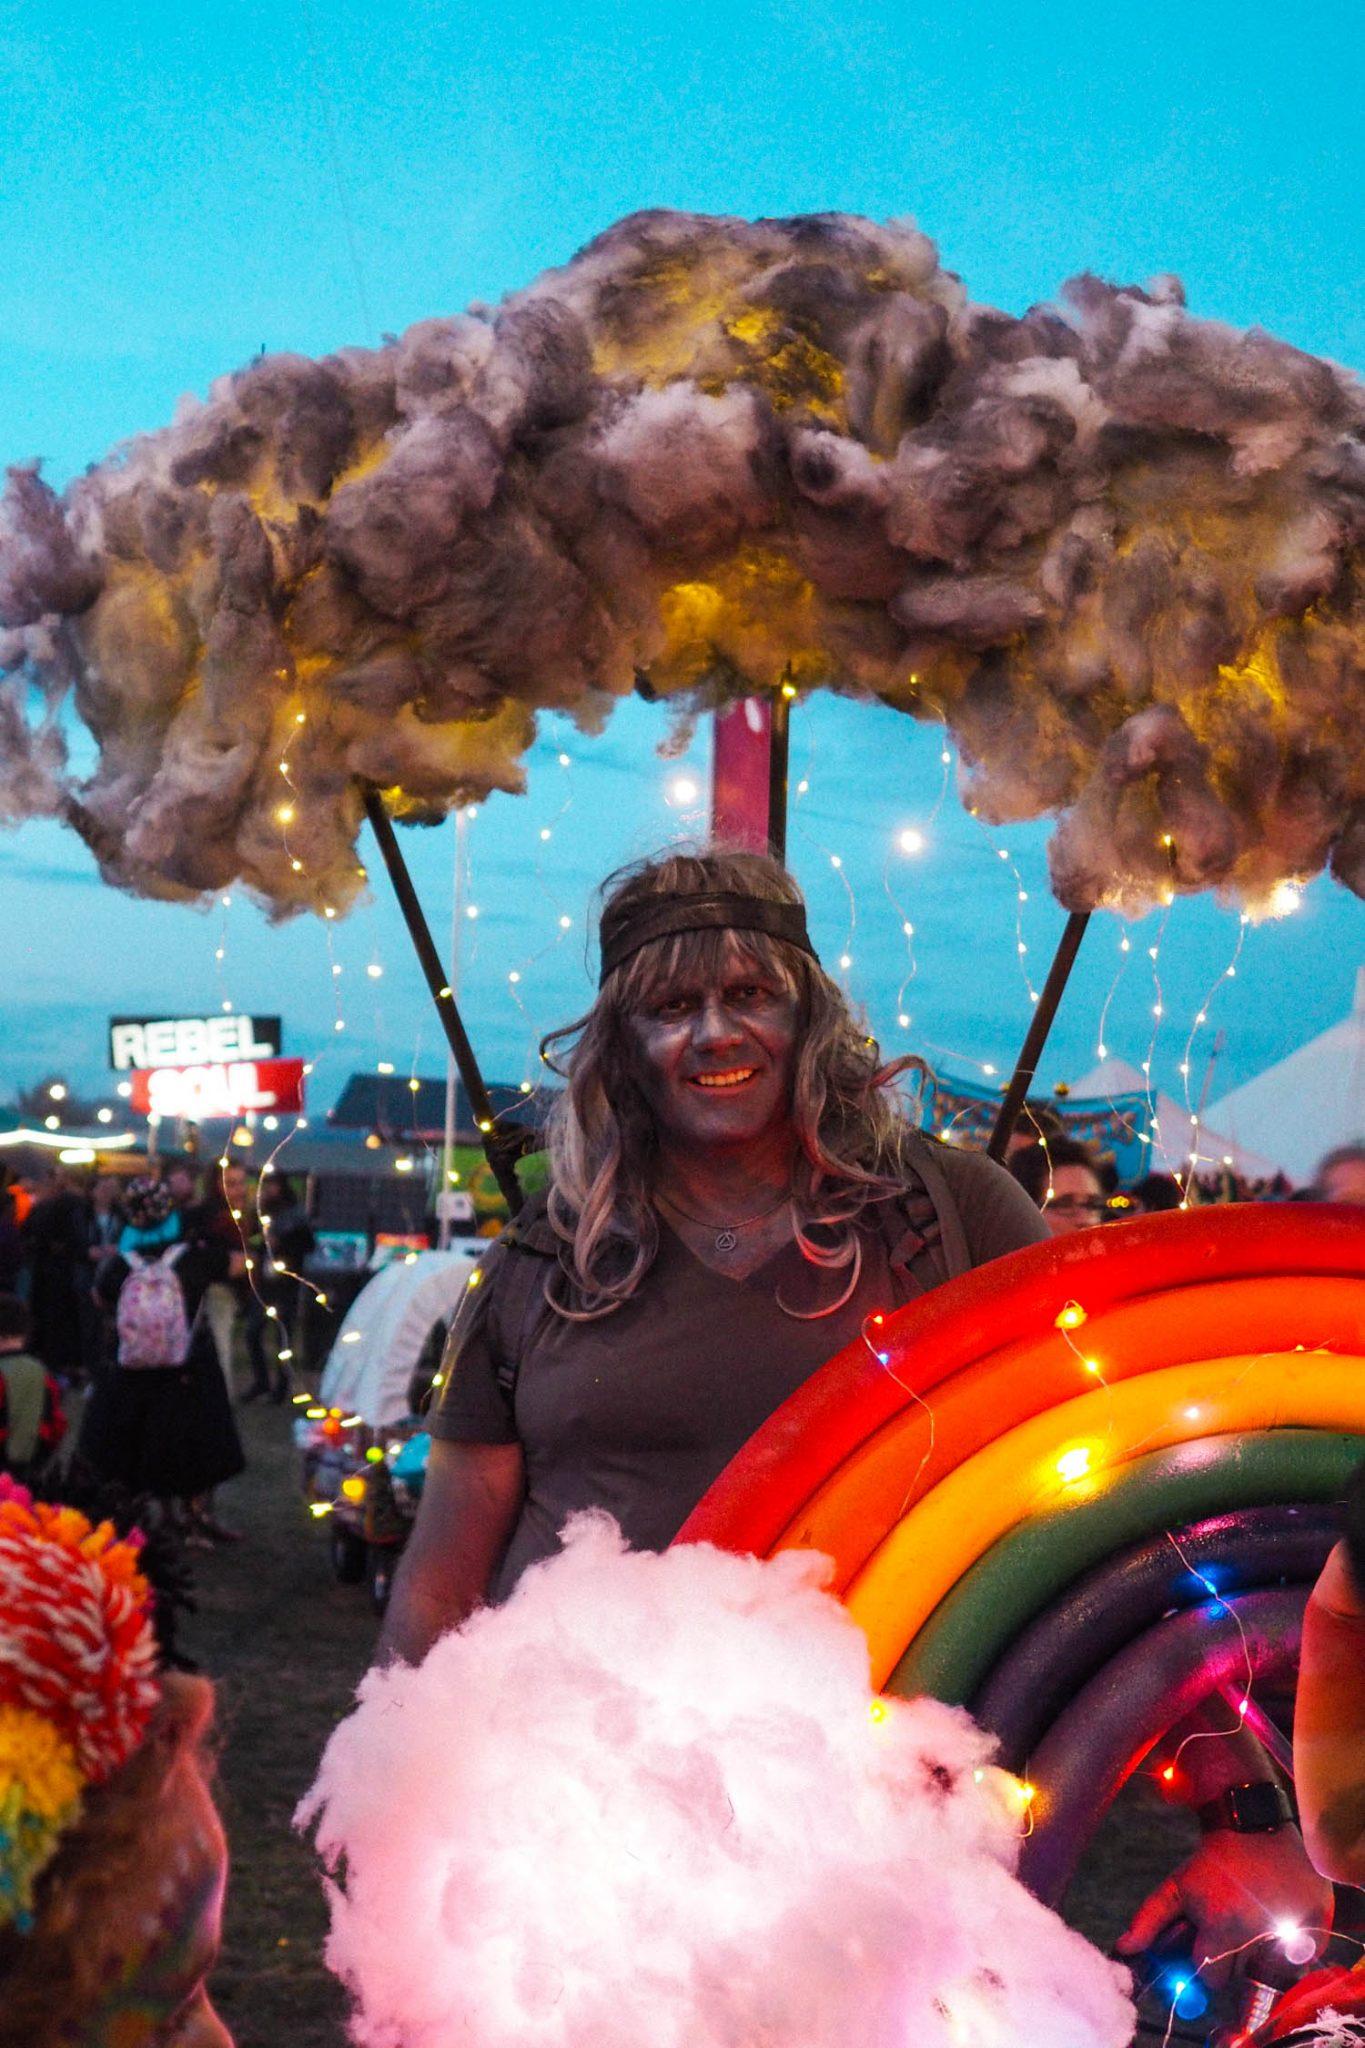 Light up cloud costume